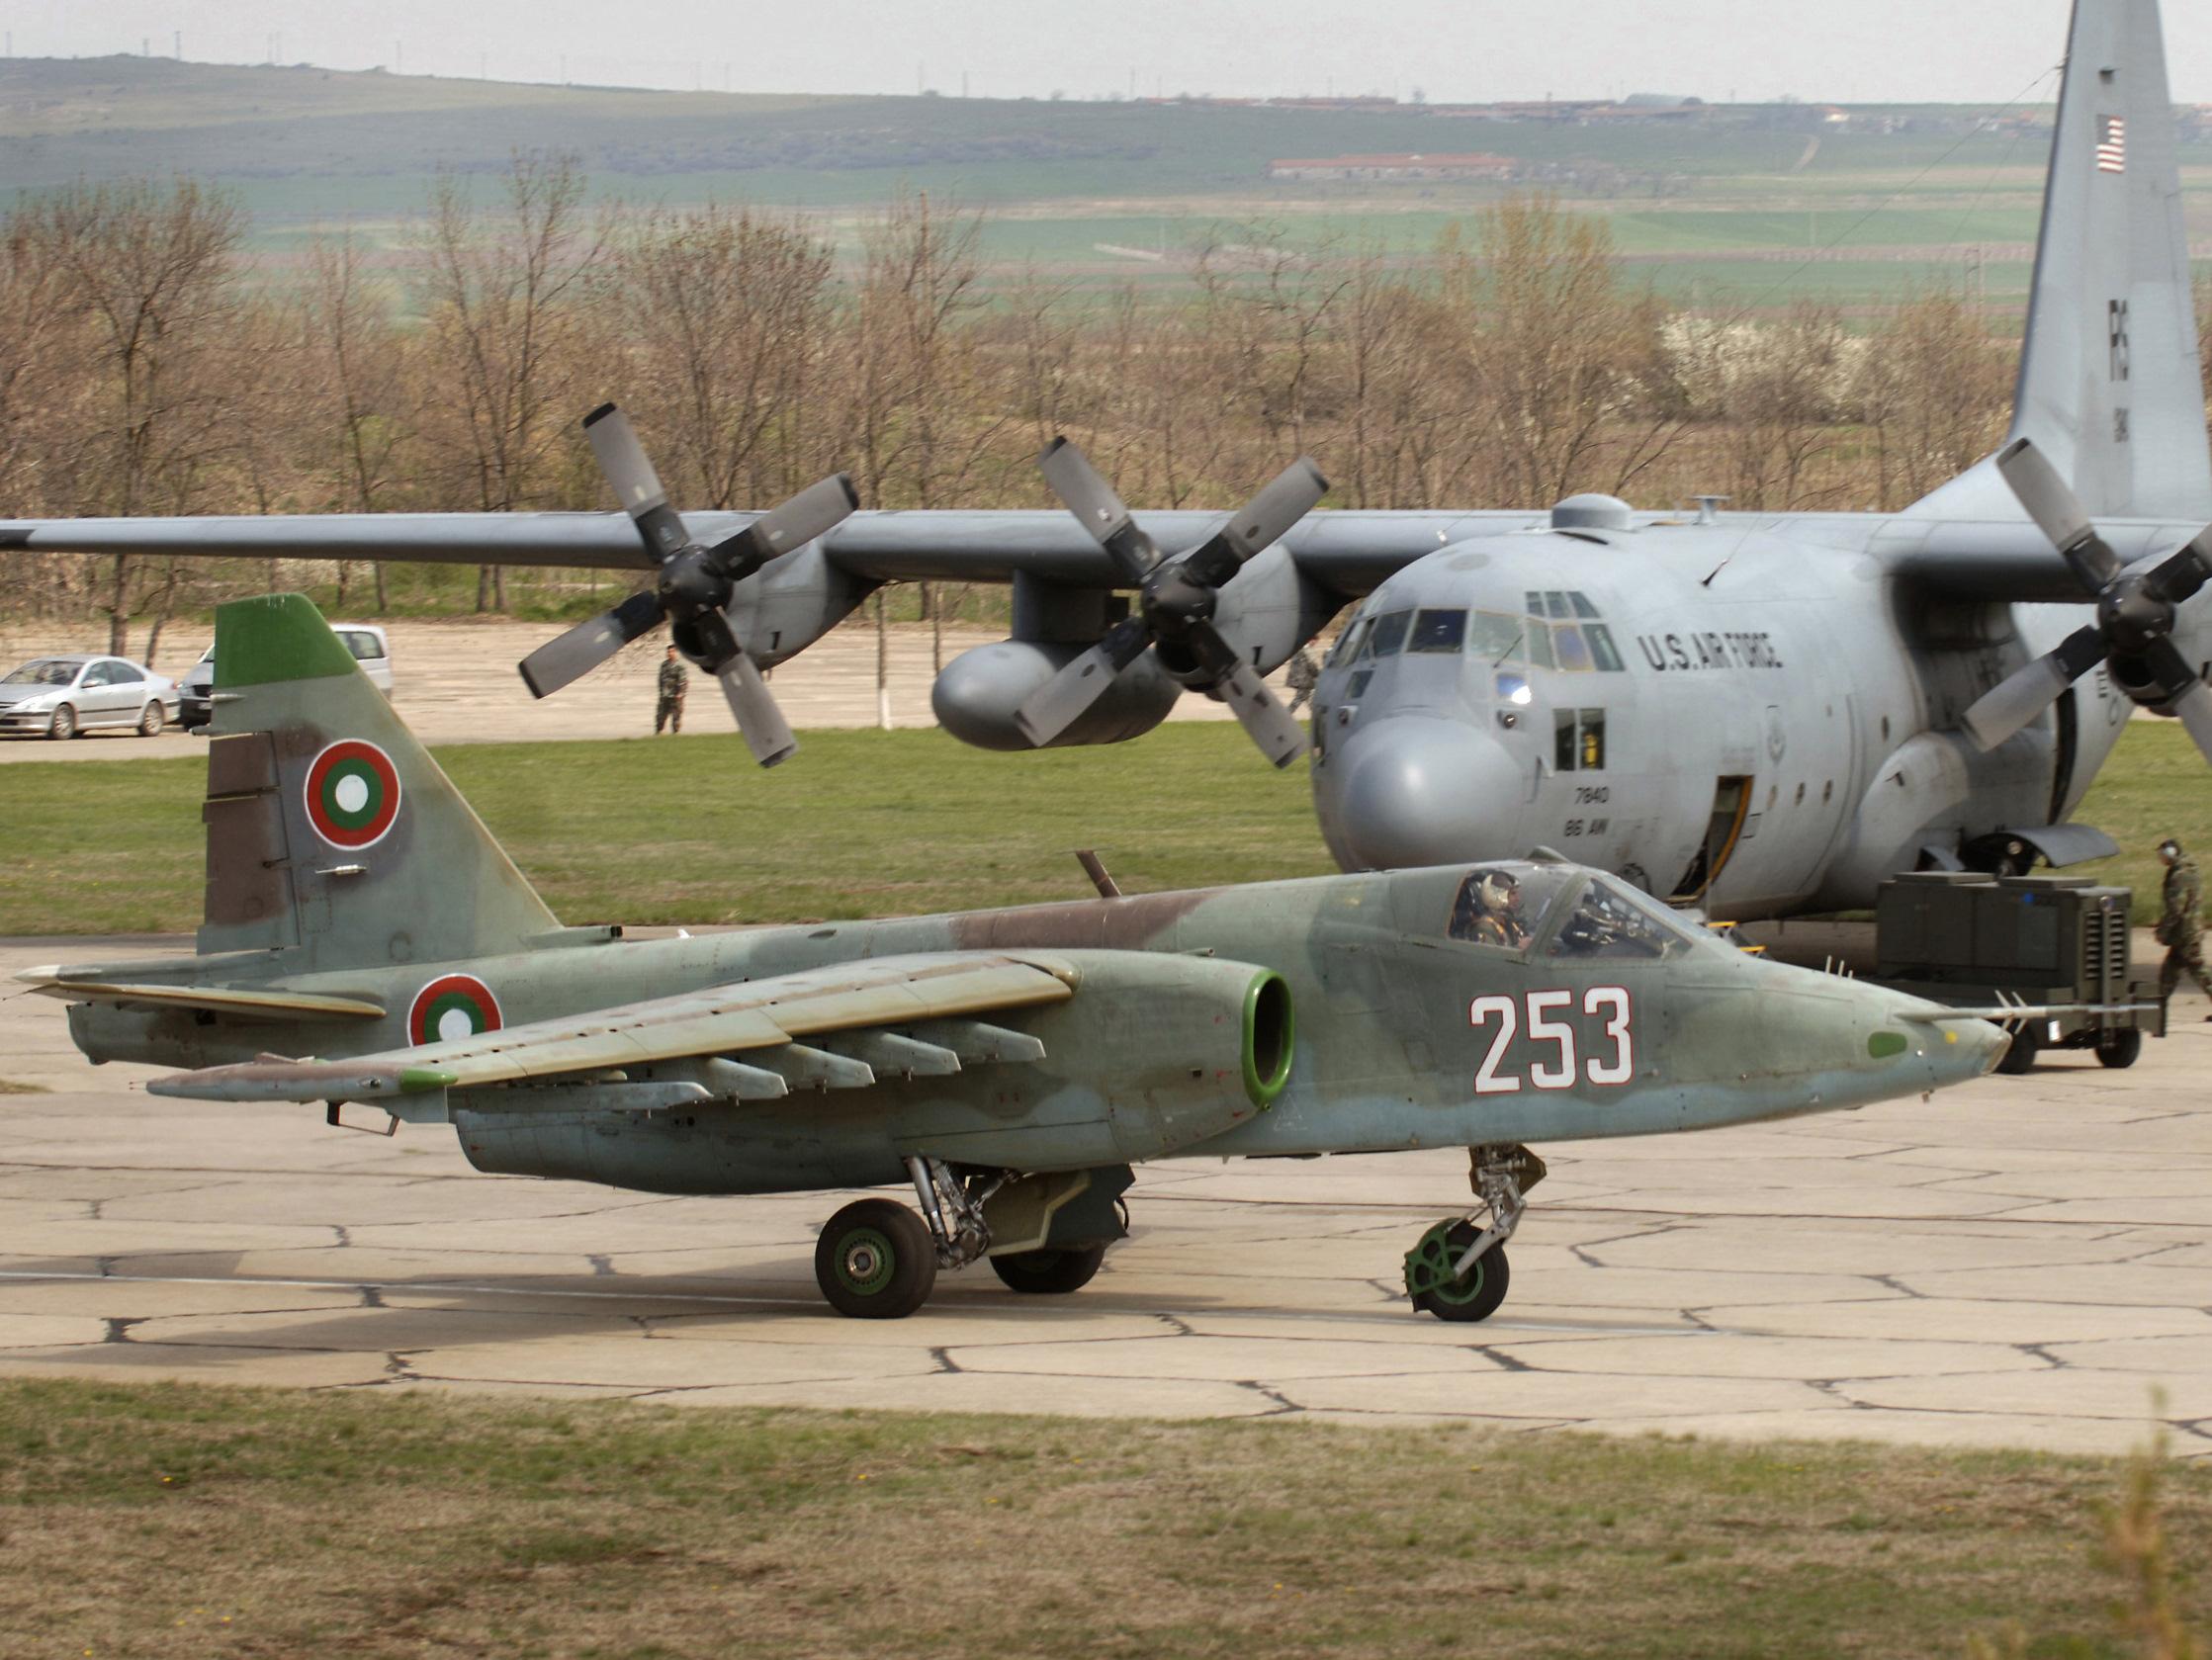 https://upload.wikimedia.org/wikipedia/commons/a/a8/Sukhoi_Su-25_BAF.jpg